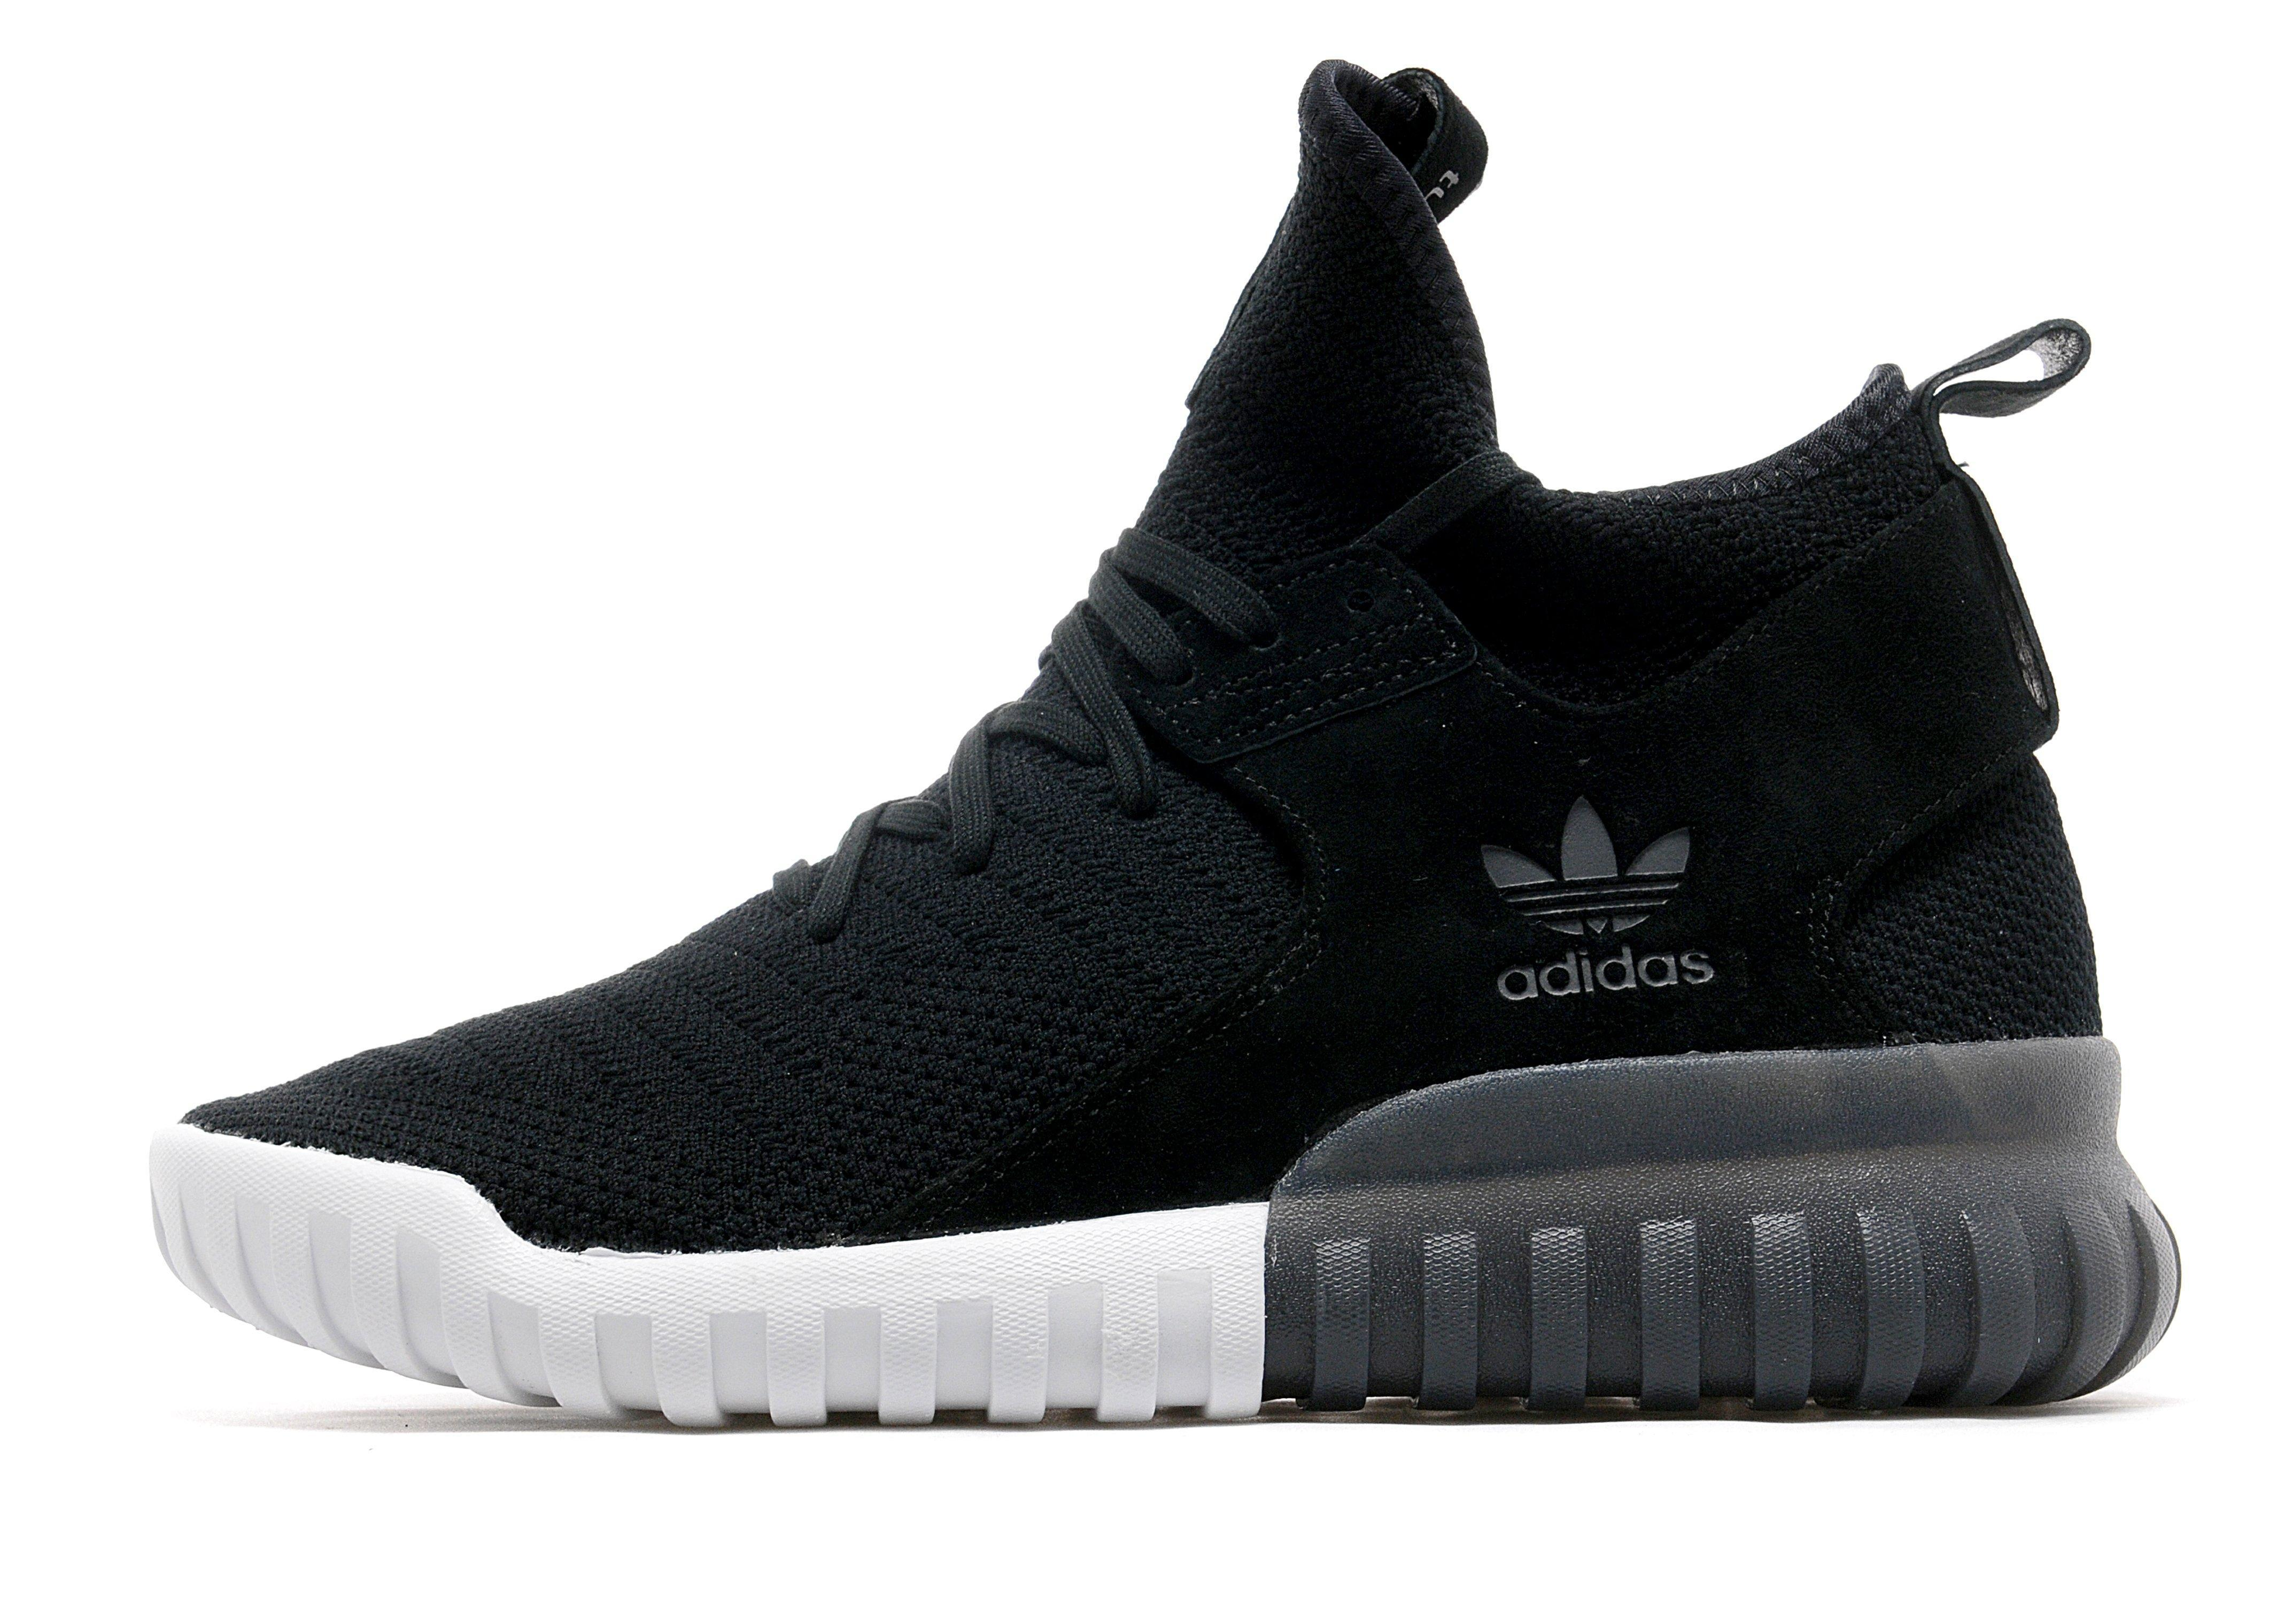 0151e7ed9904 Lyst - adidas Originals Tubular X Primeknit in Black for Men